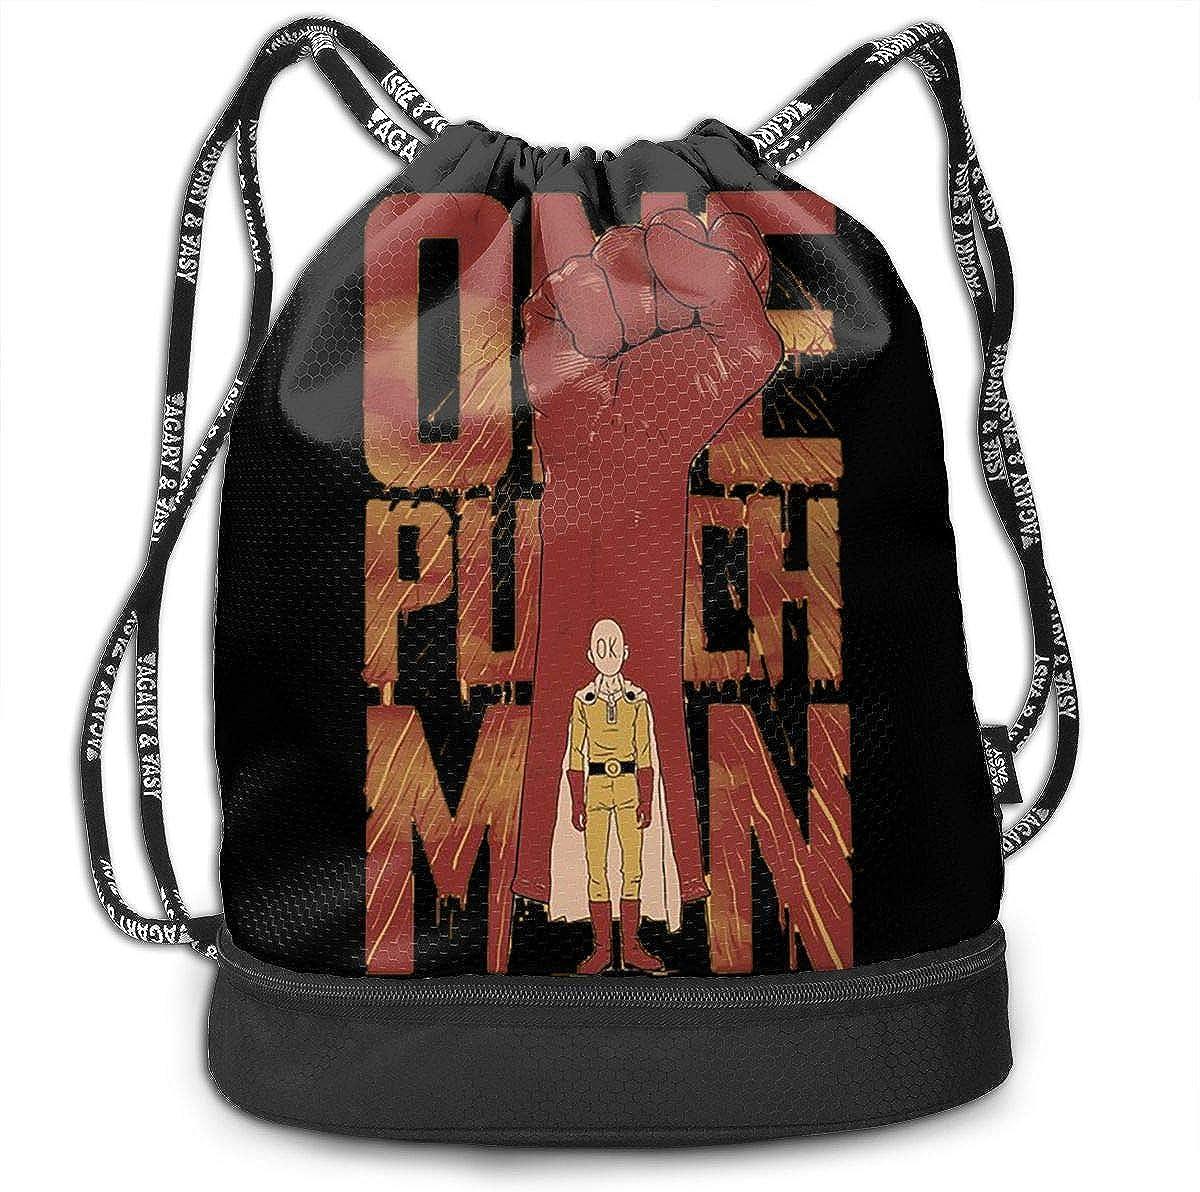 Lushuqing One Punch Man Drawstring Backpack Foldable Gym Tote Dance Bag for Swimming Shopping Sports Women Men Boys Girls